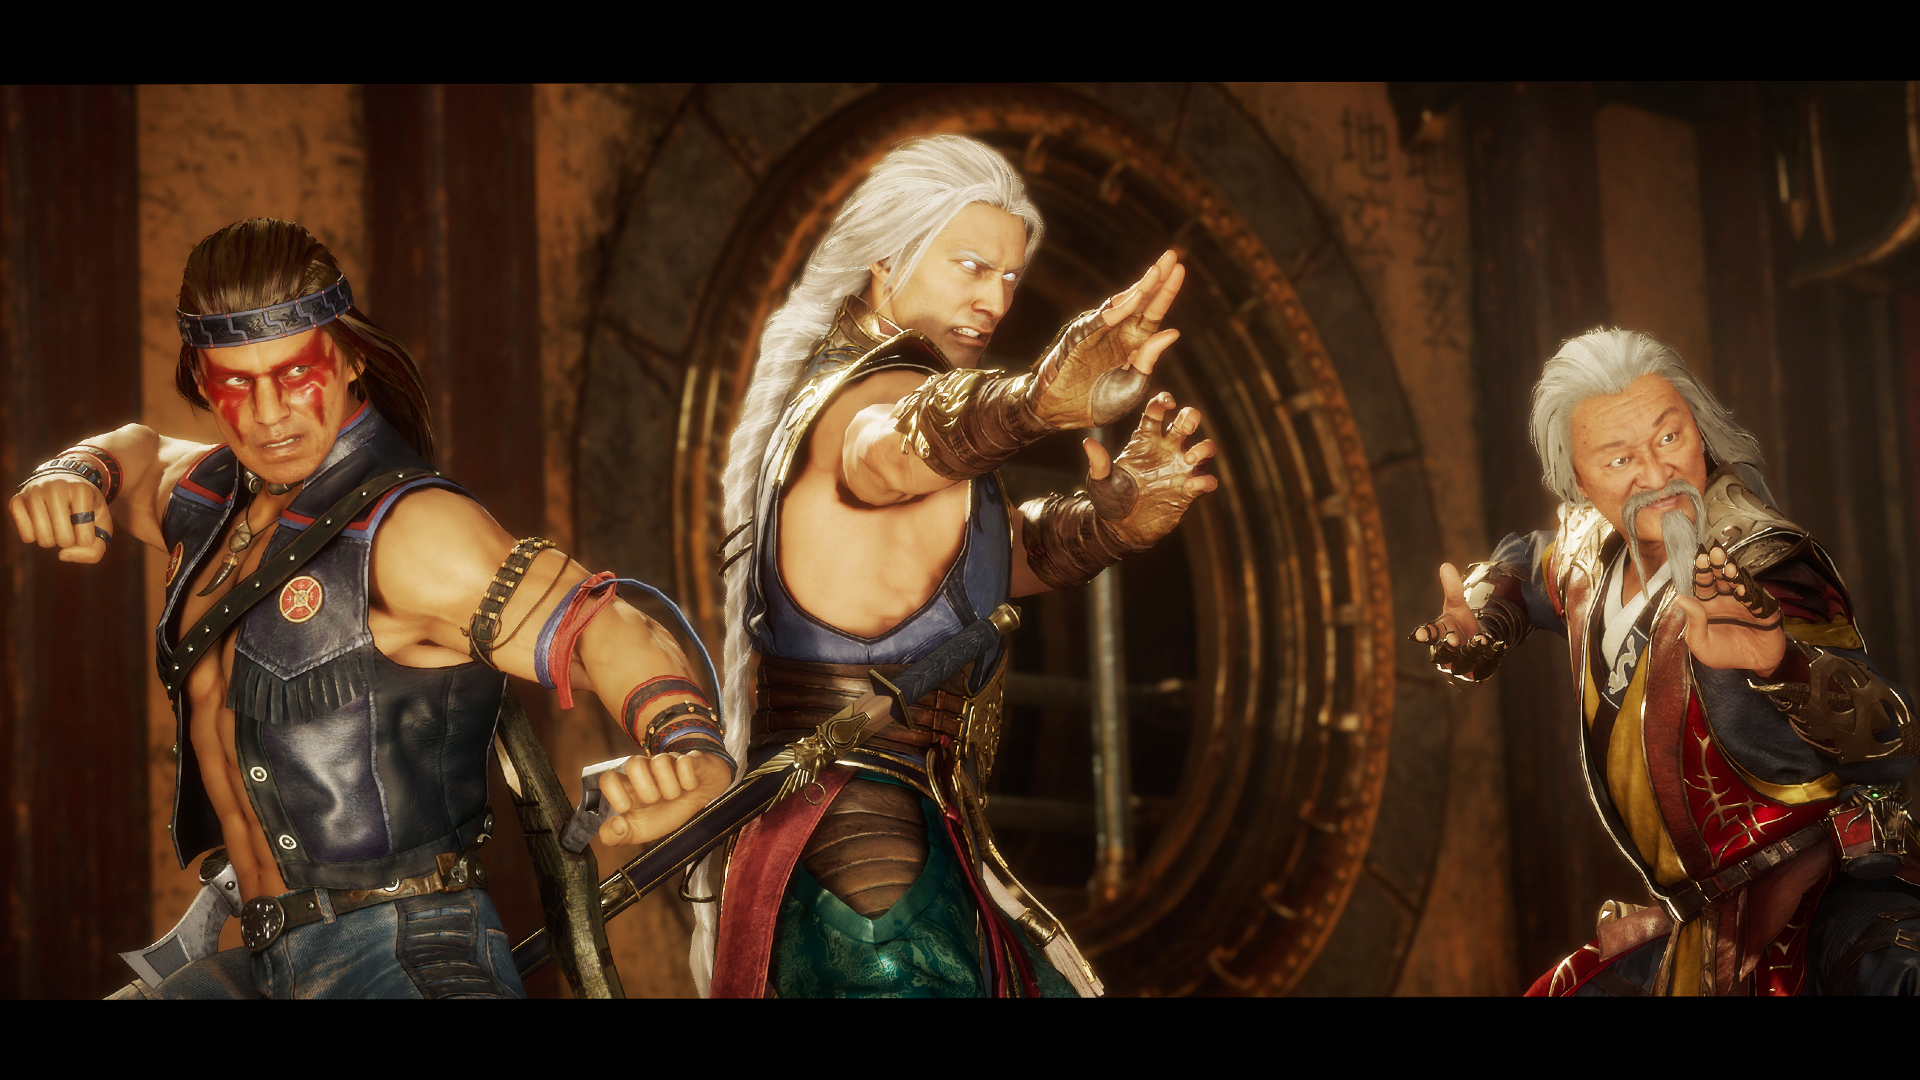 Mortal Kombat 11 Aftermath Dlc Adds New Story Robocop